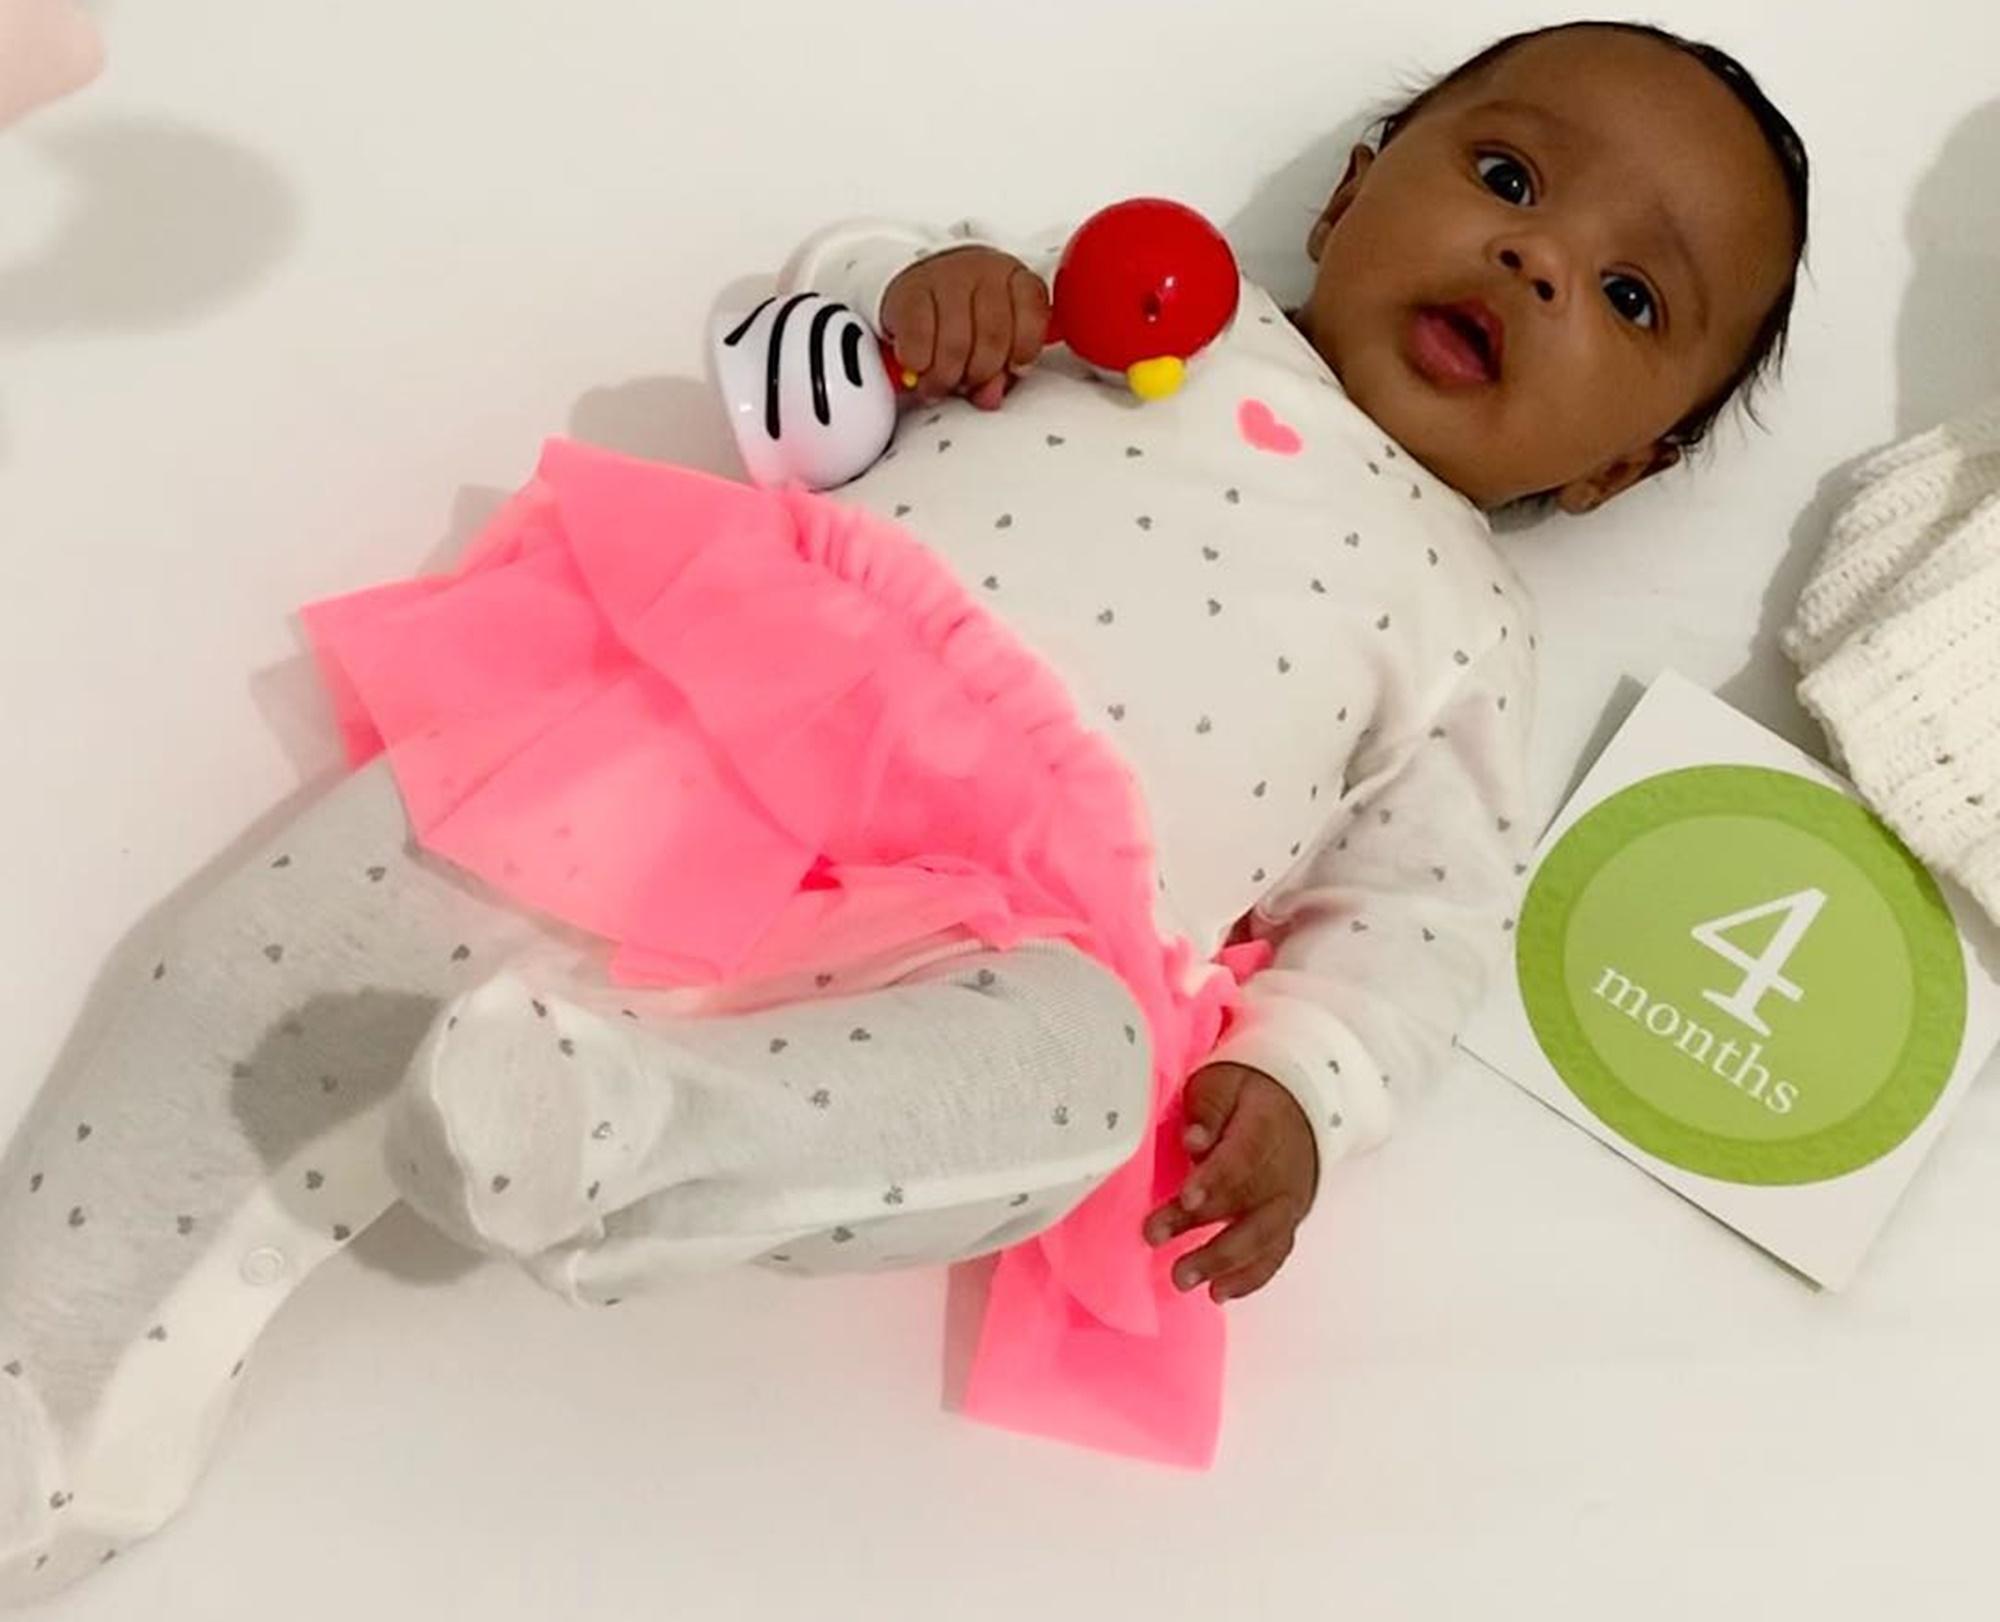 Baby Brooklyn Daly Kenya Moore